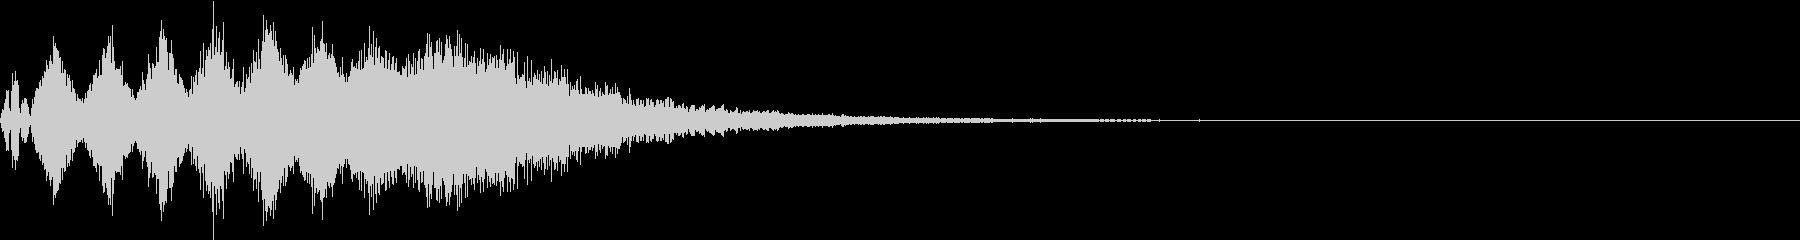 TVFX 目立たせ・アイキャッチ 17の未再生の波形